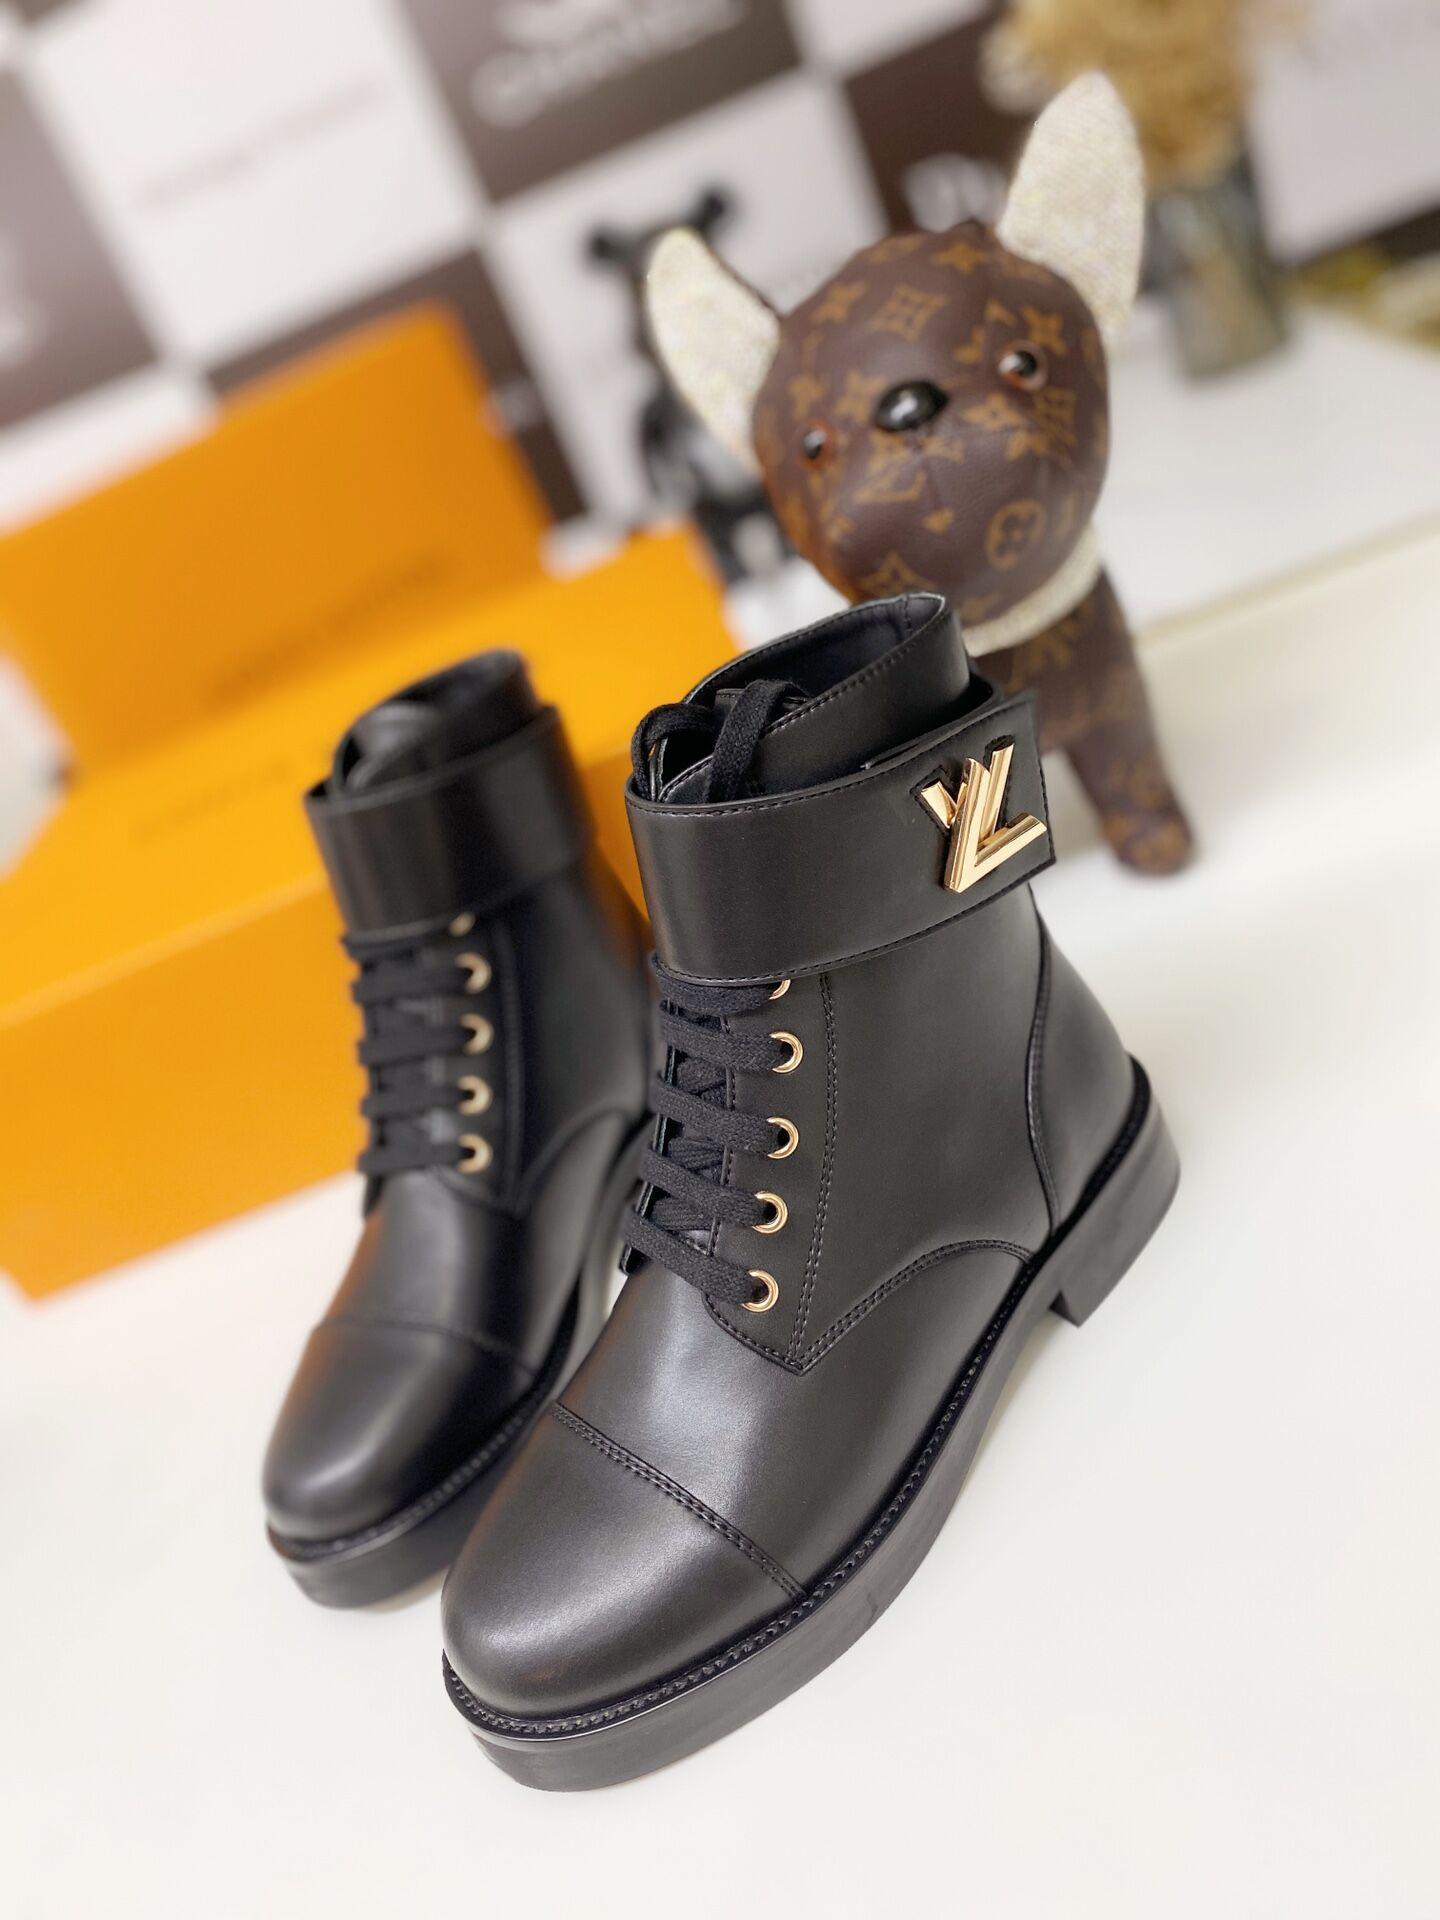 lv wonderland ranger lv boot lv women shoes 1A1IY2